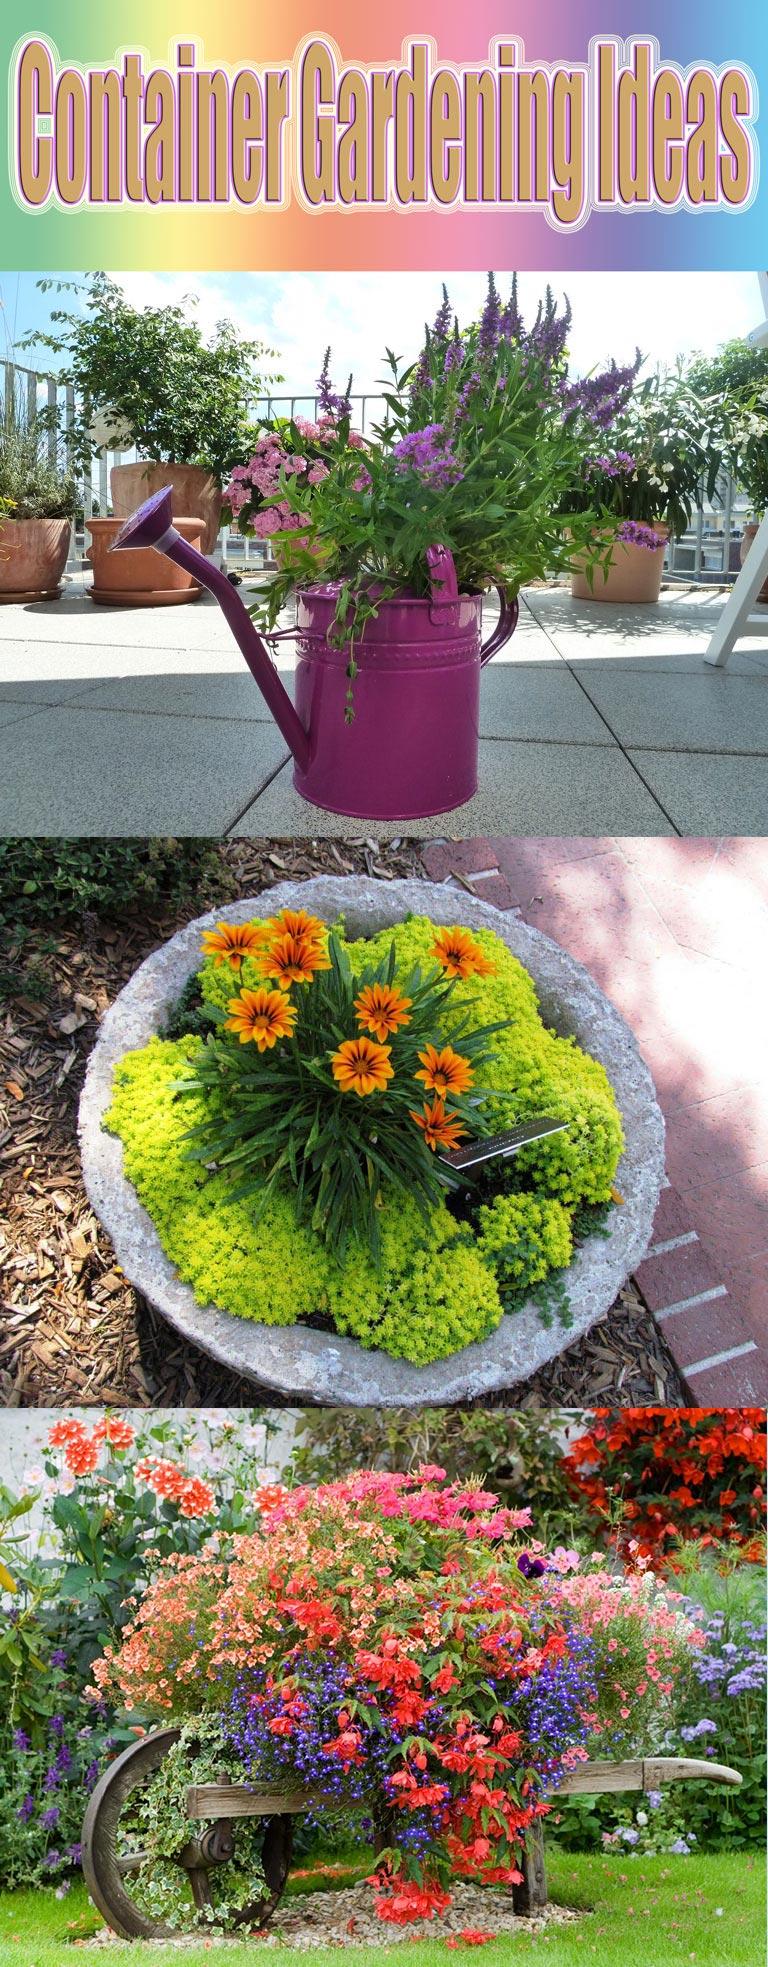 Container Gardening Ideas Quiet CornerContainer Gardening Ideas